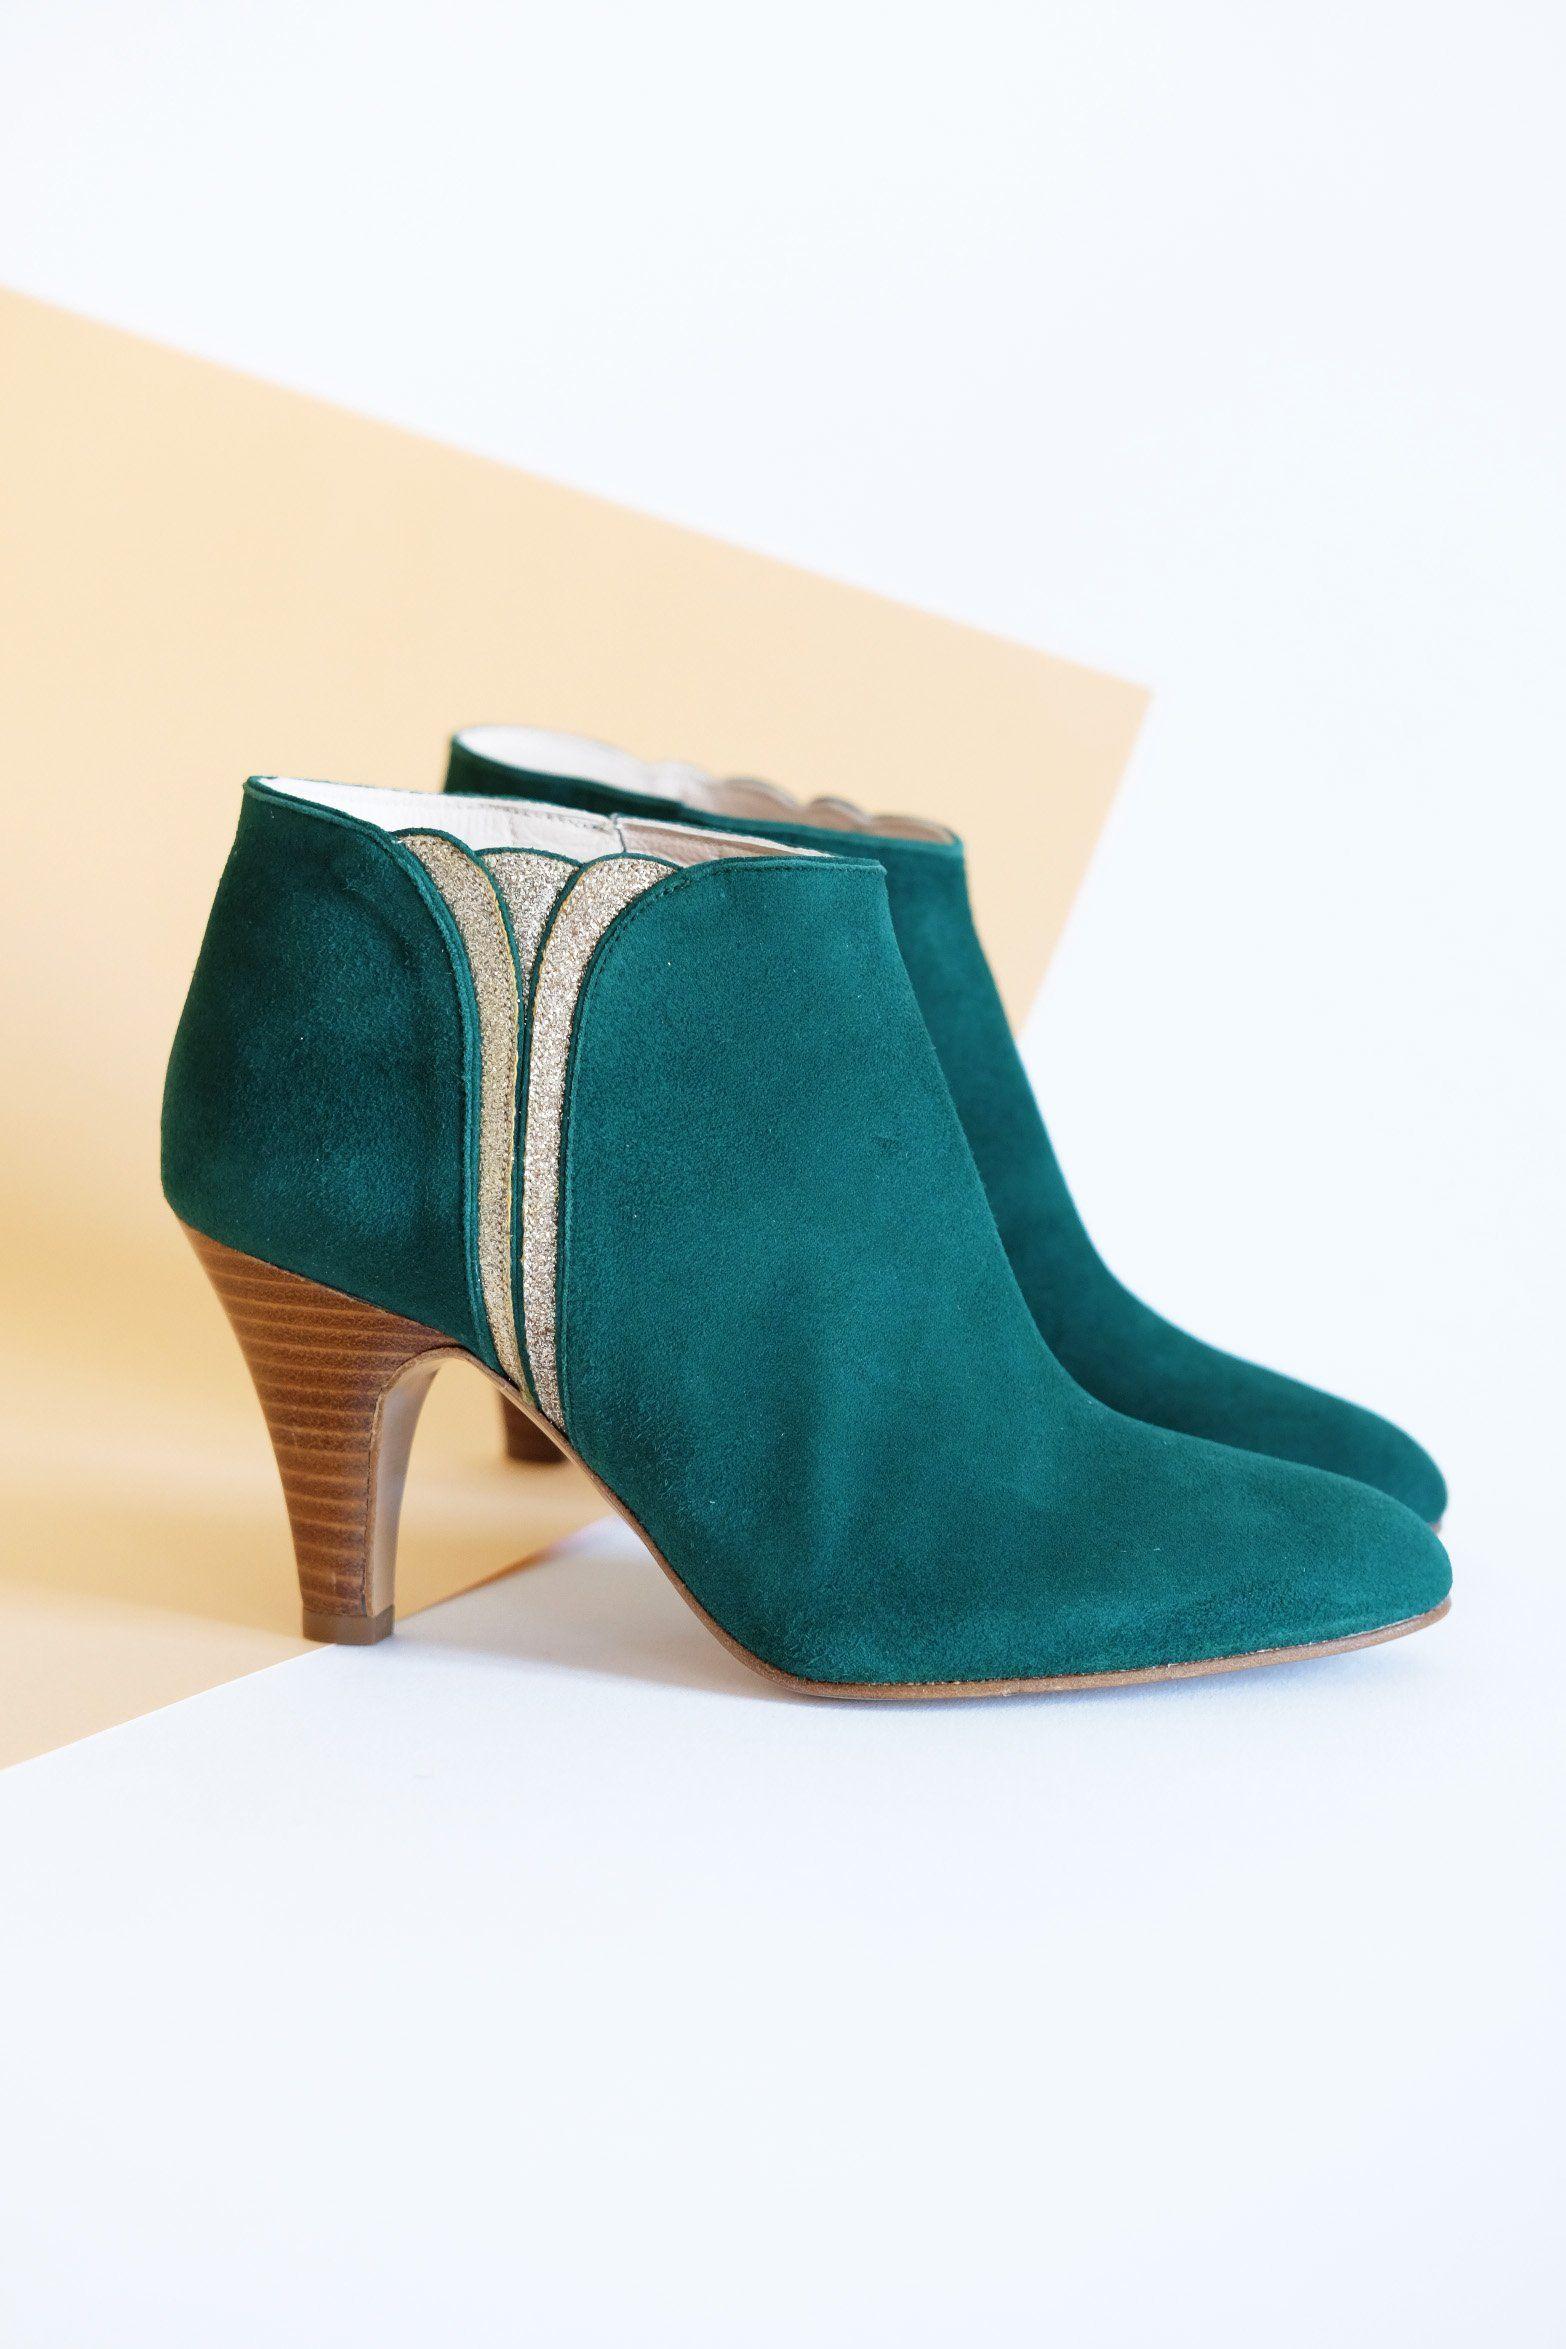 bonny Boots Sublime Evergreen Patricia Blanchet | Sapatos